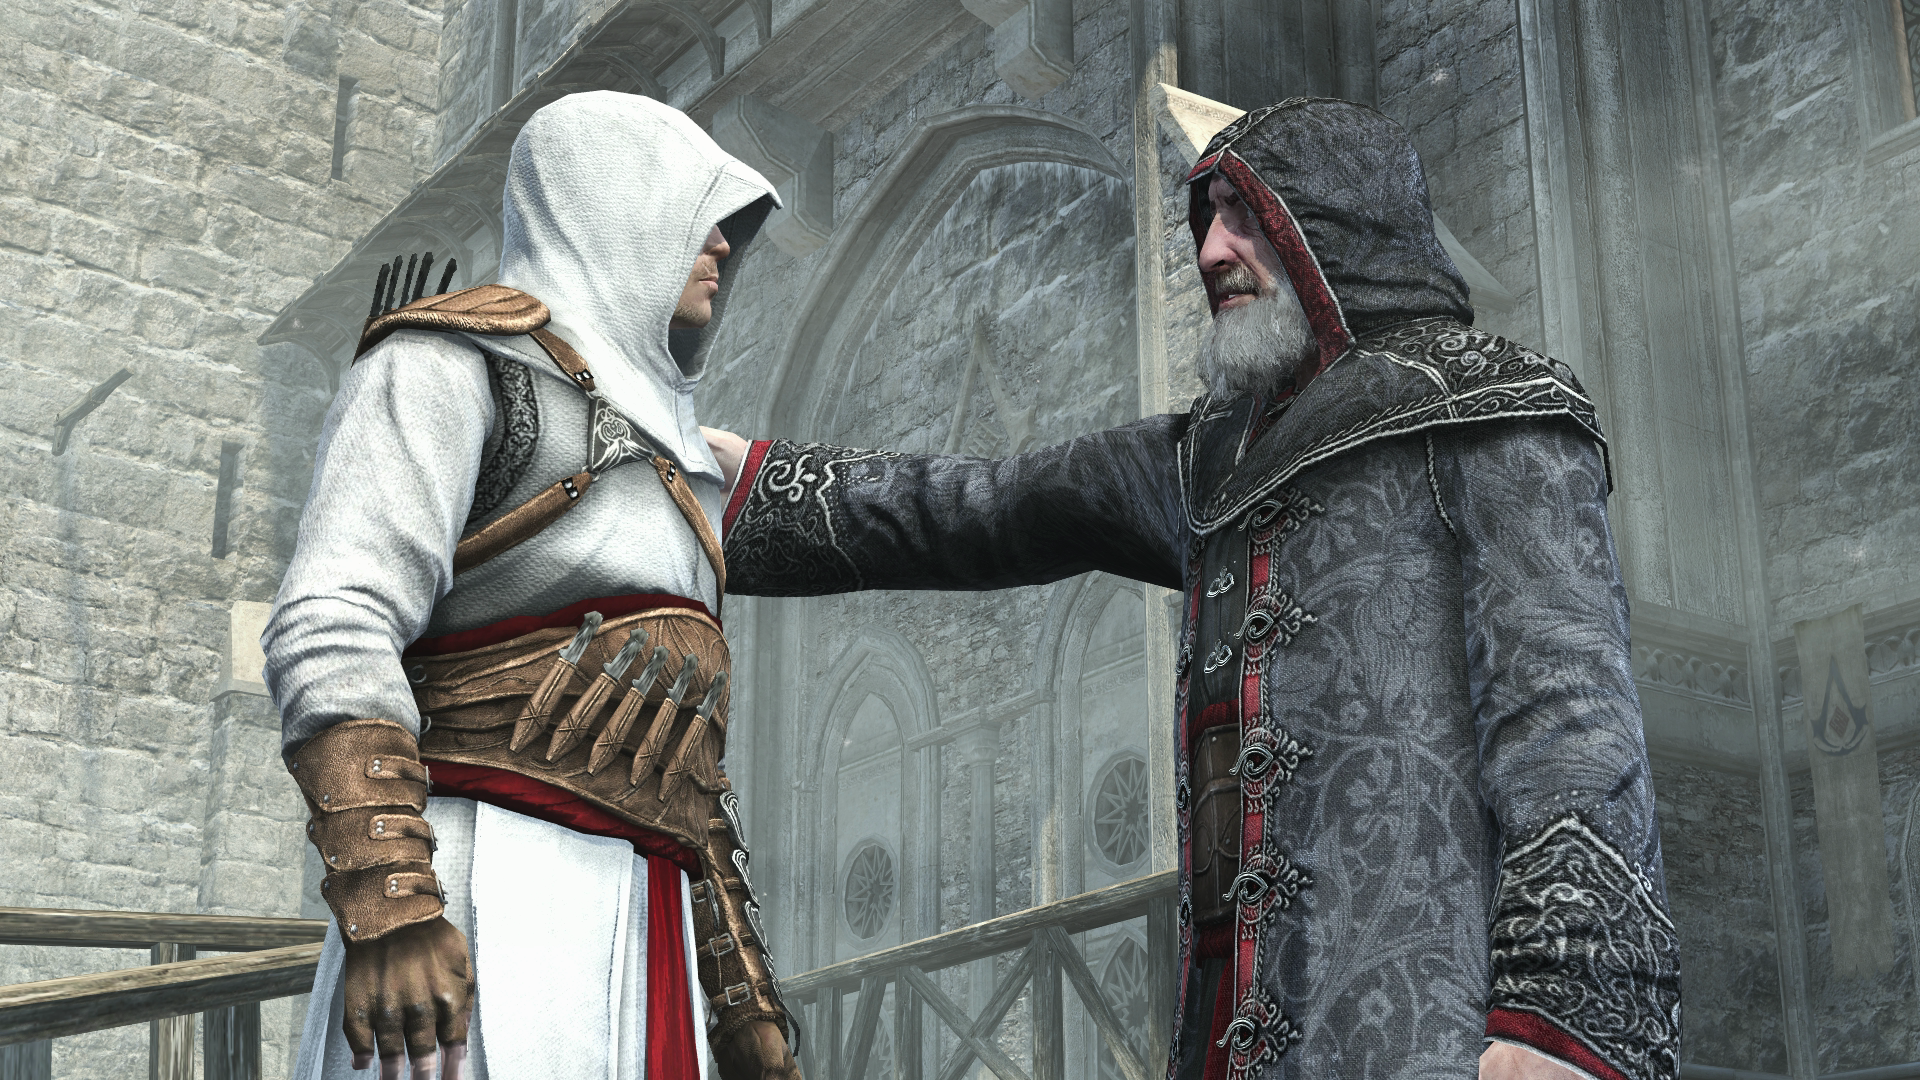 Pin van bustr baxtr op Assassin's Creed in 2020